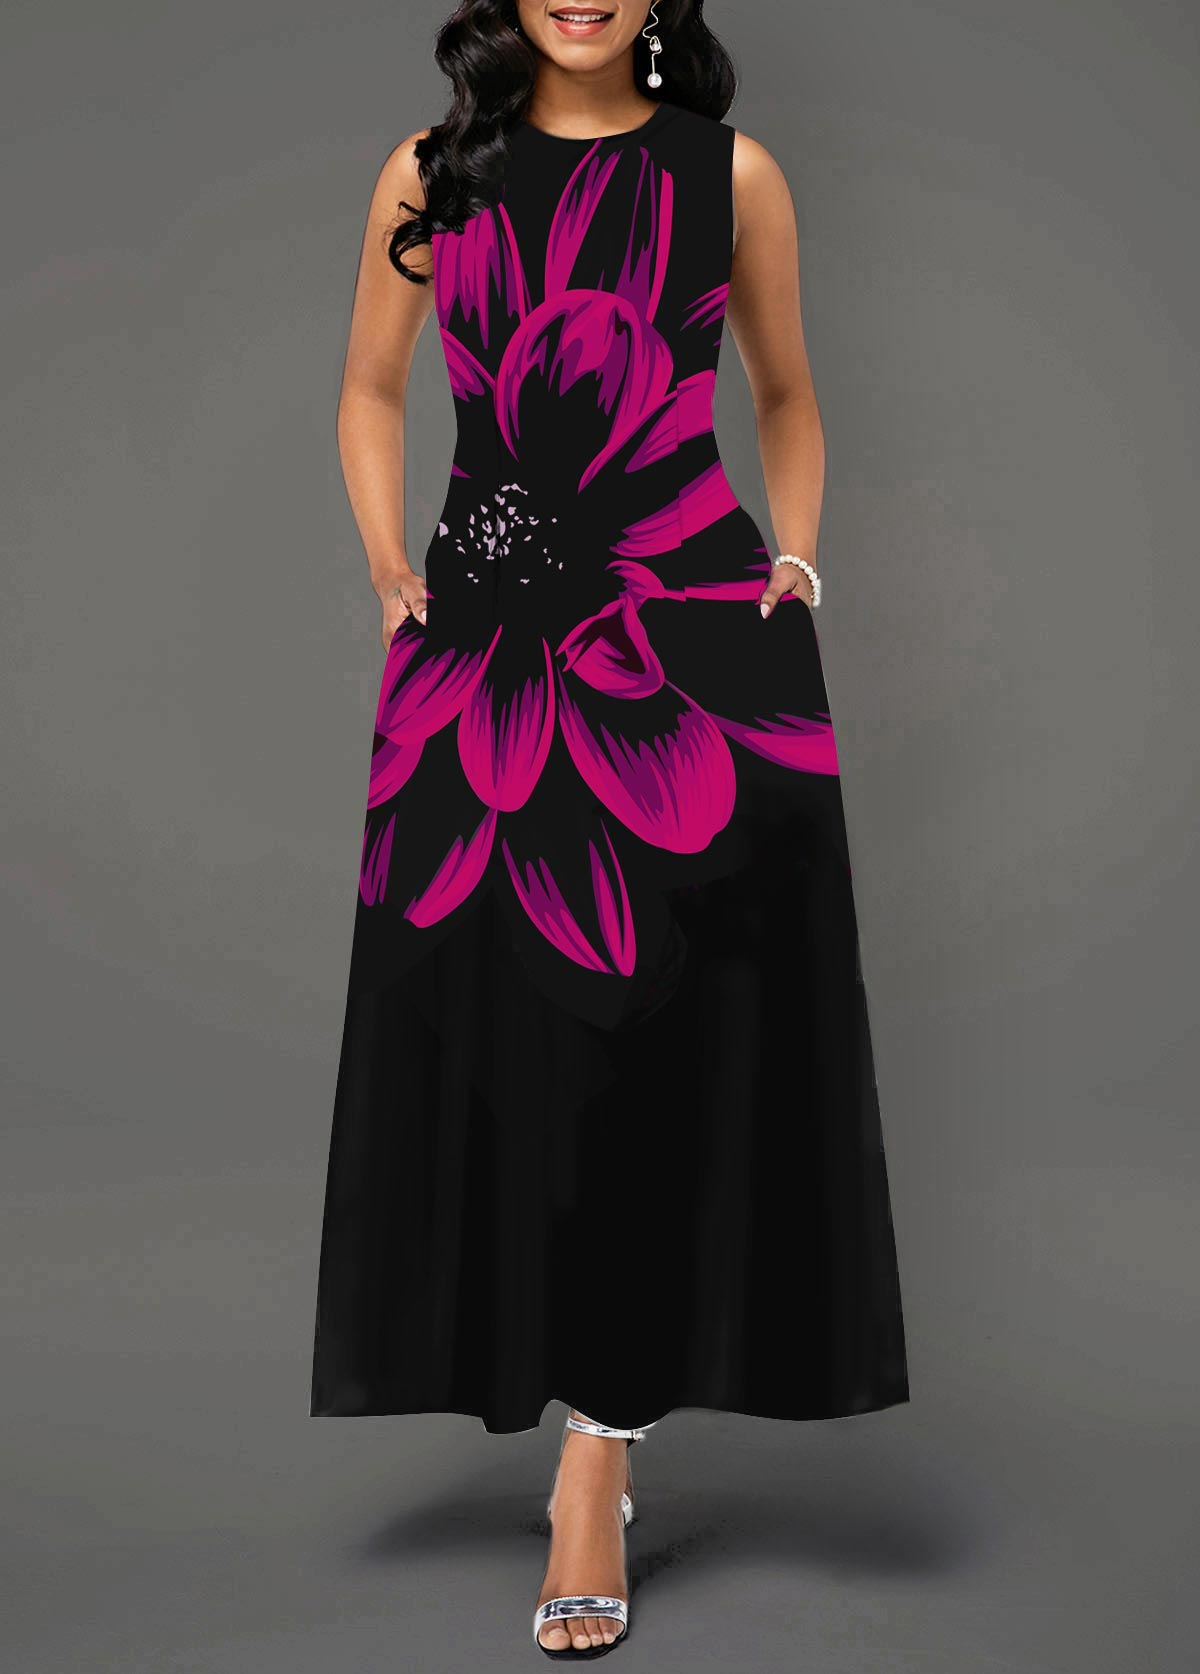 ROTITA Large Floral Print Sleeveless Pocket Dress